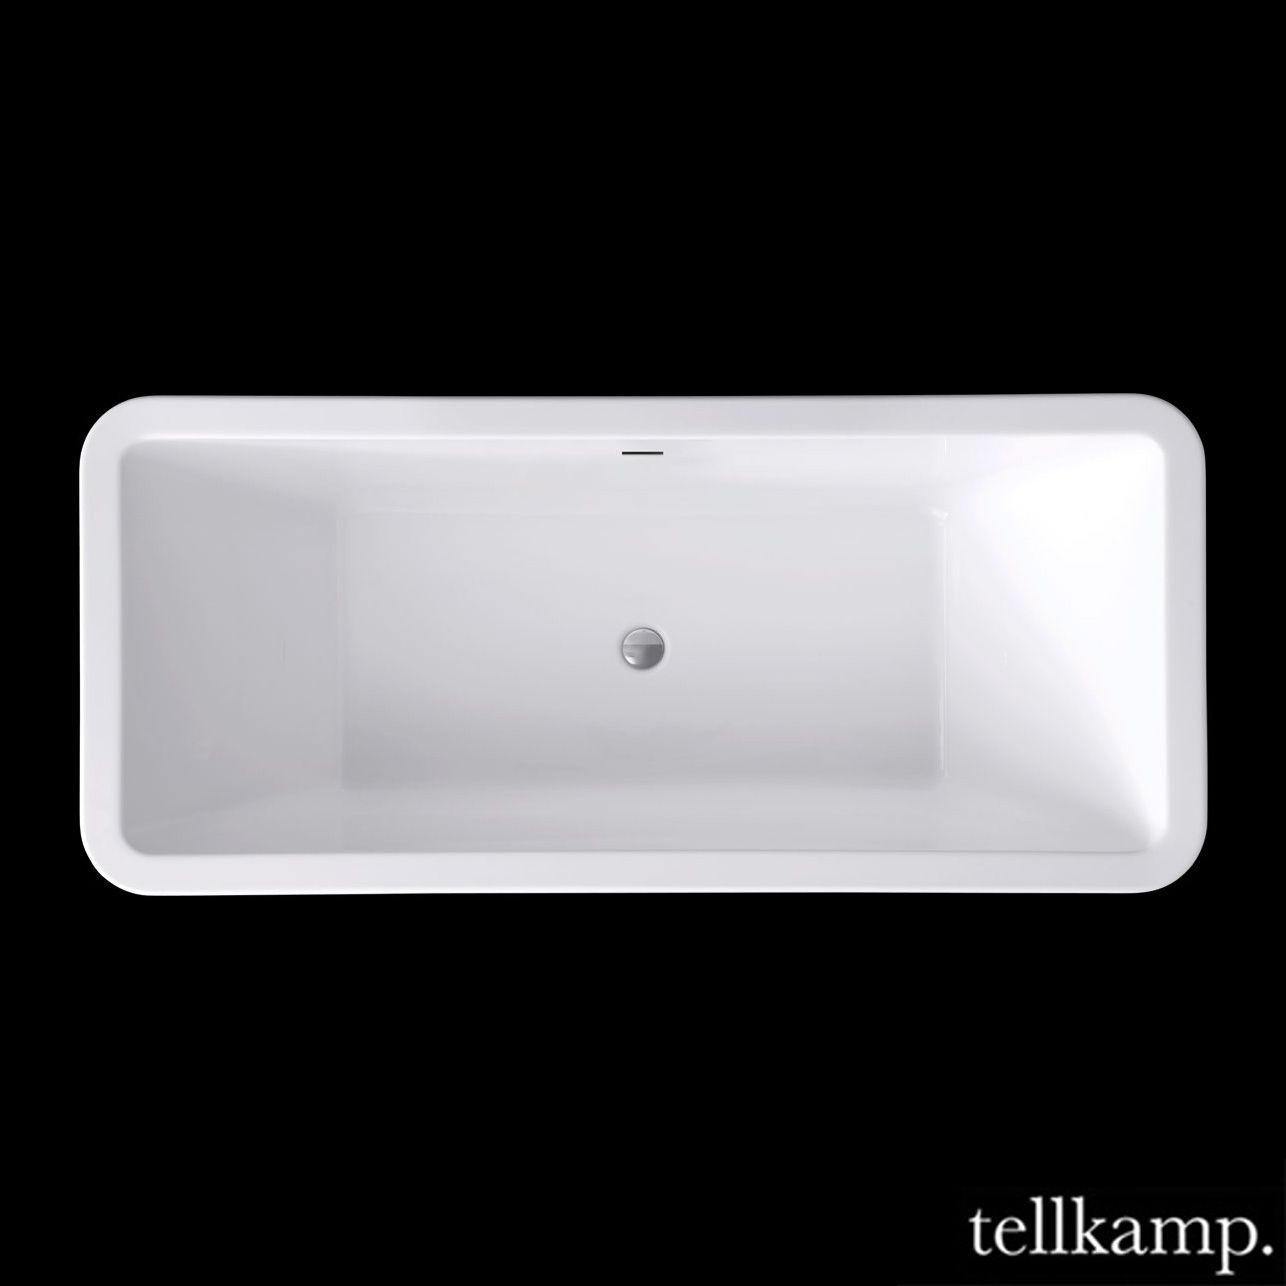 Tellkamp Pura Fix Rechteck Badewanne 0400 285 A Cr Reuter Onlineshop Badewanne Wanne Grosse Badezimmer